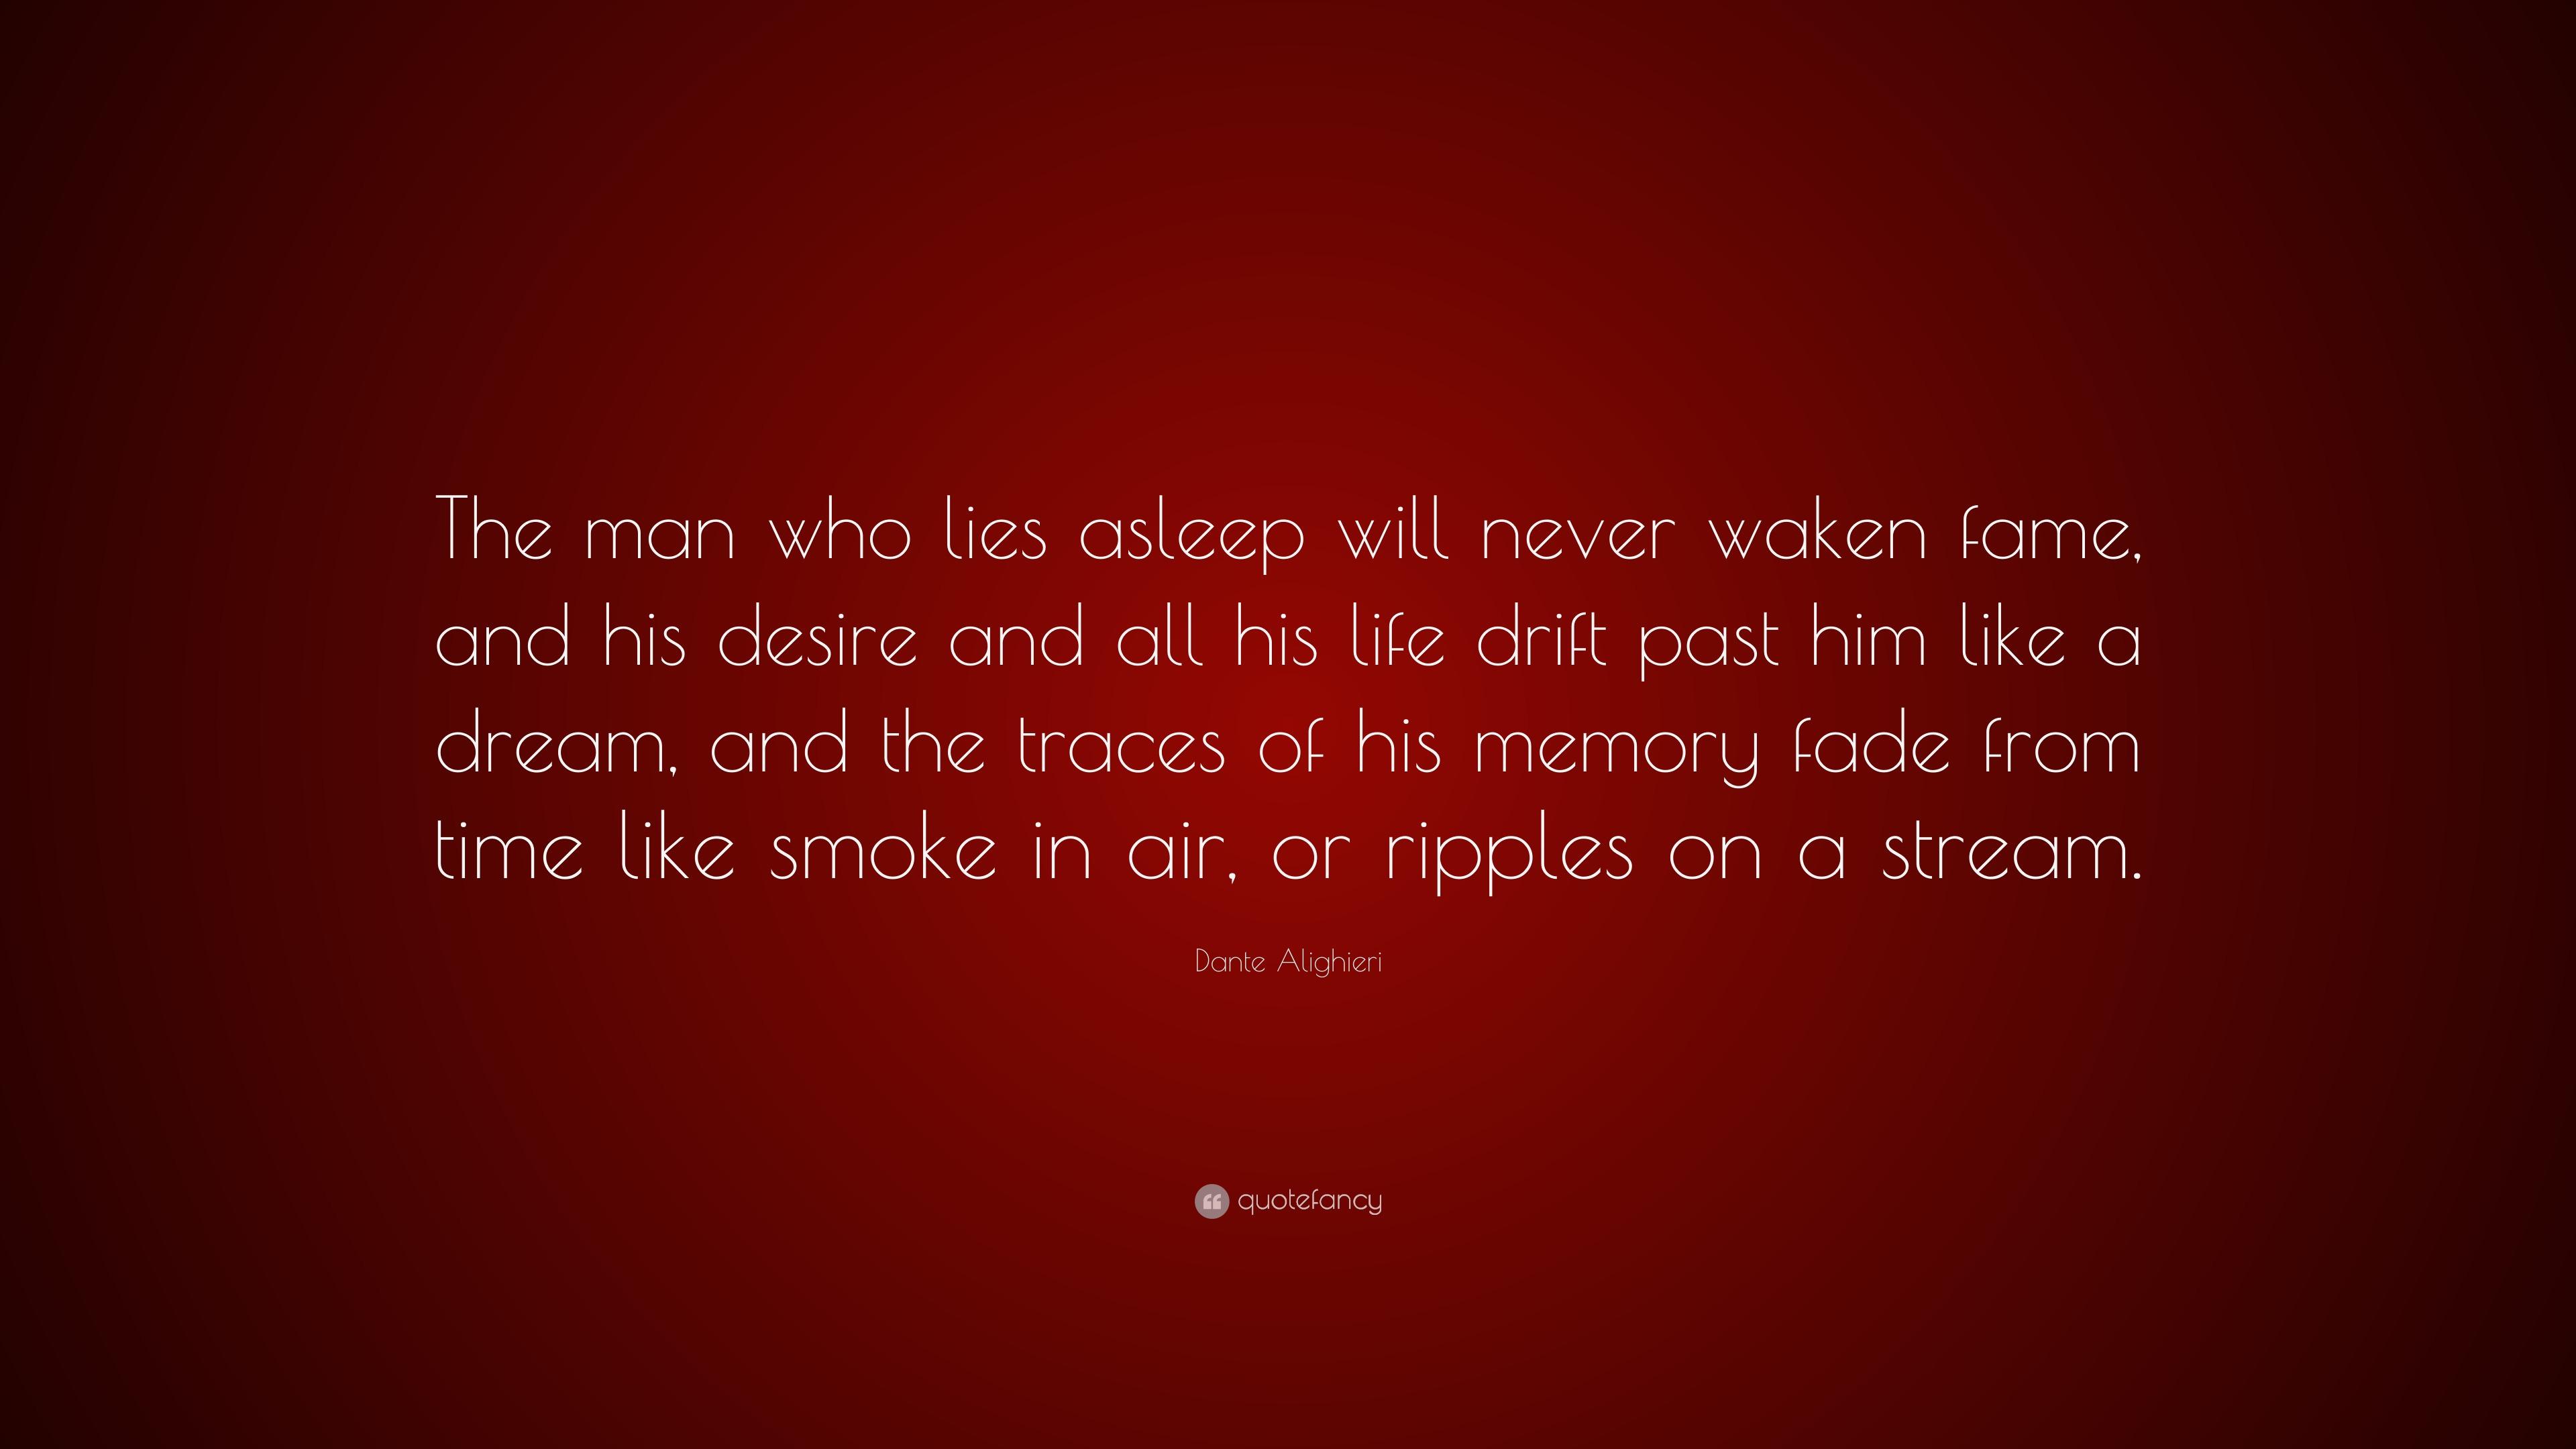 Dante Alighieri Quote The Man Who Lies Asleep Will Never Waken